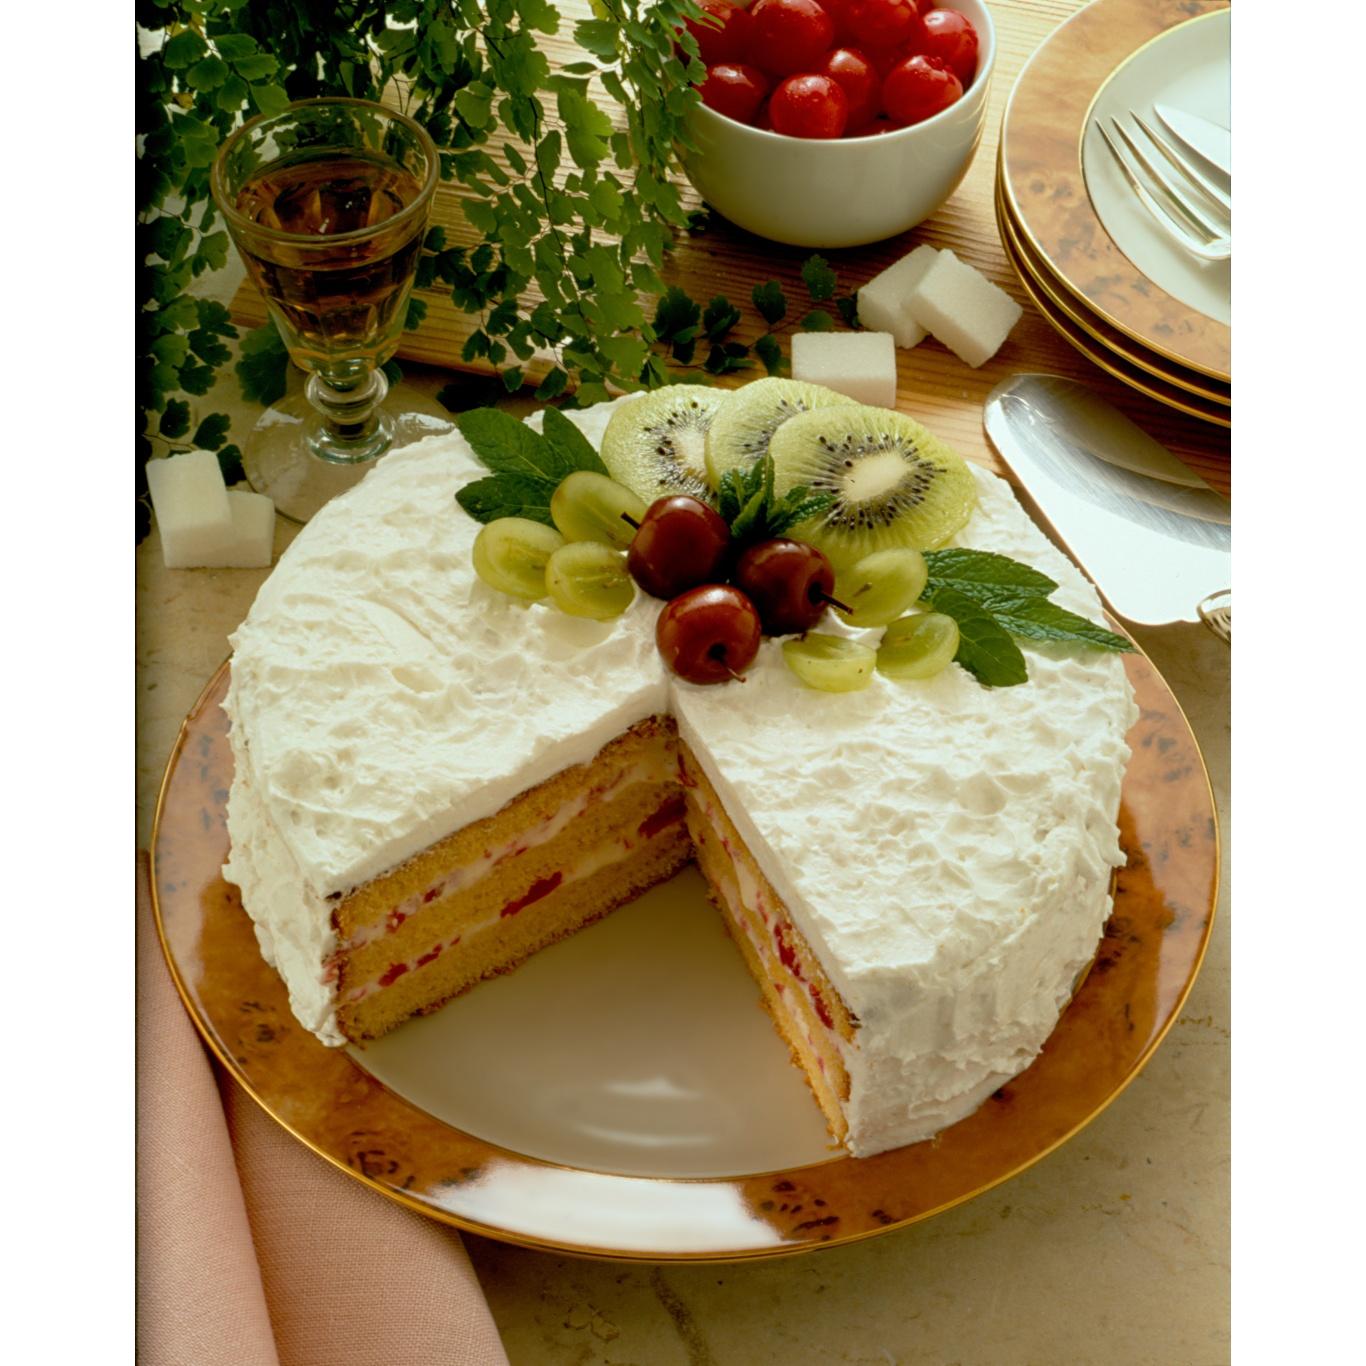 Silverwood Round Sandwich Pan Loose Base 12ins/30cm